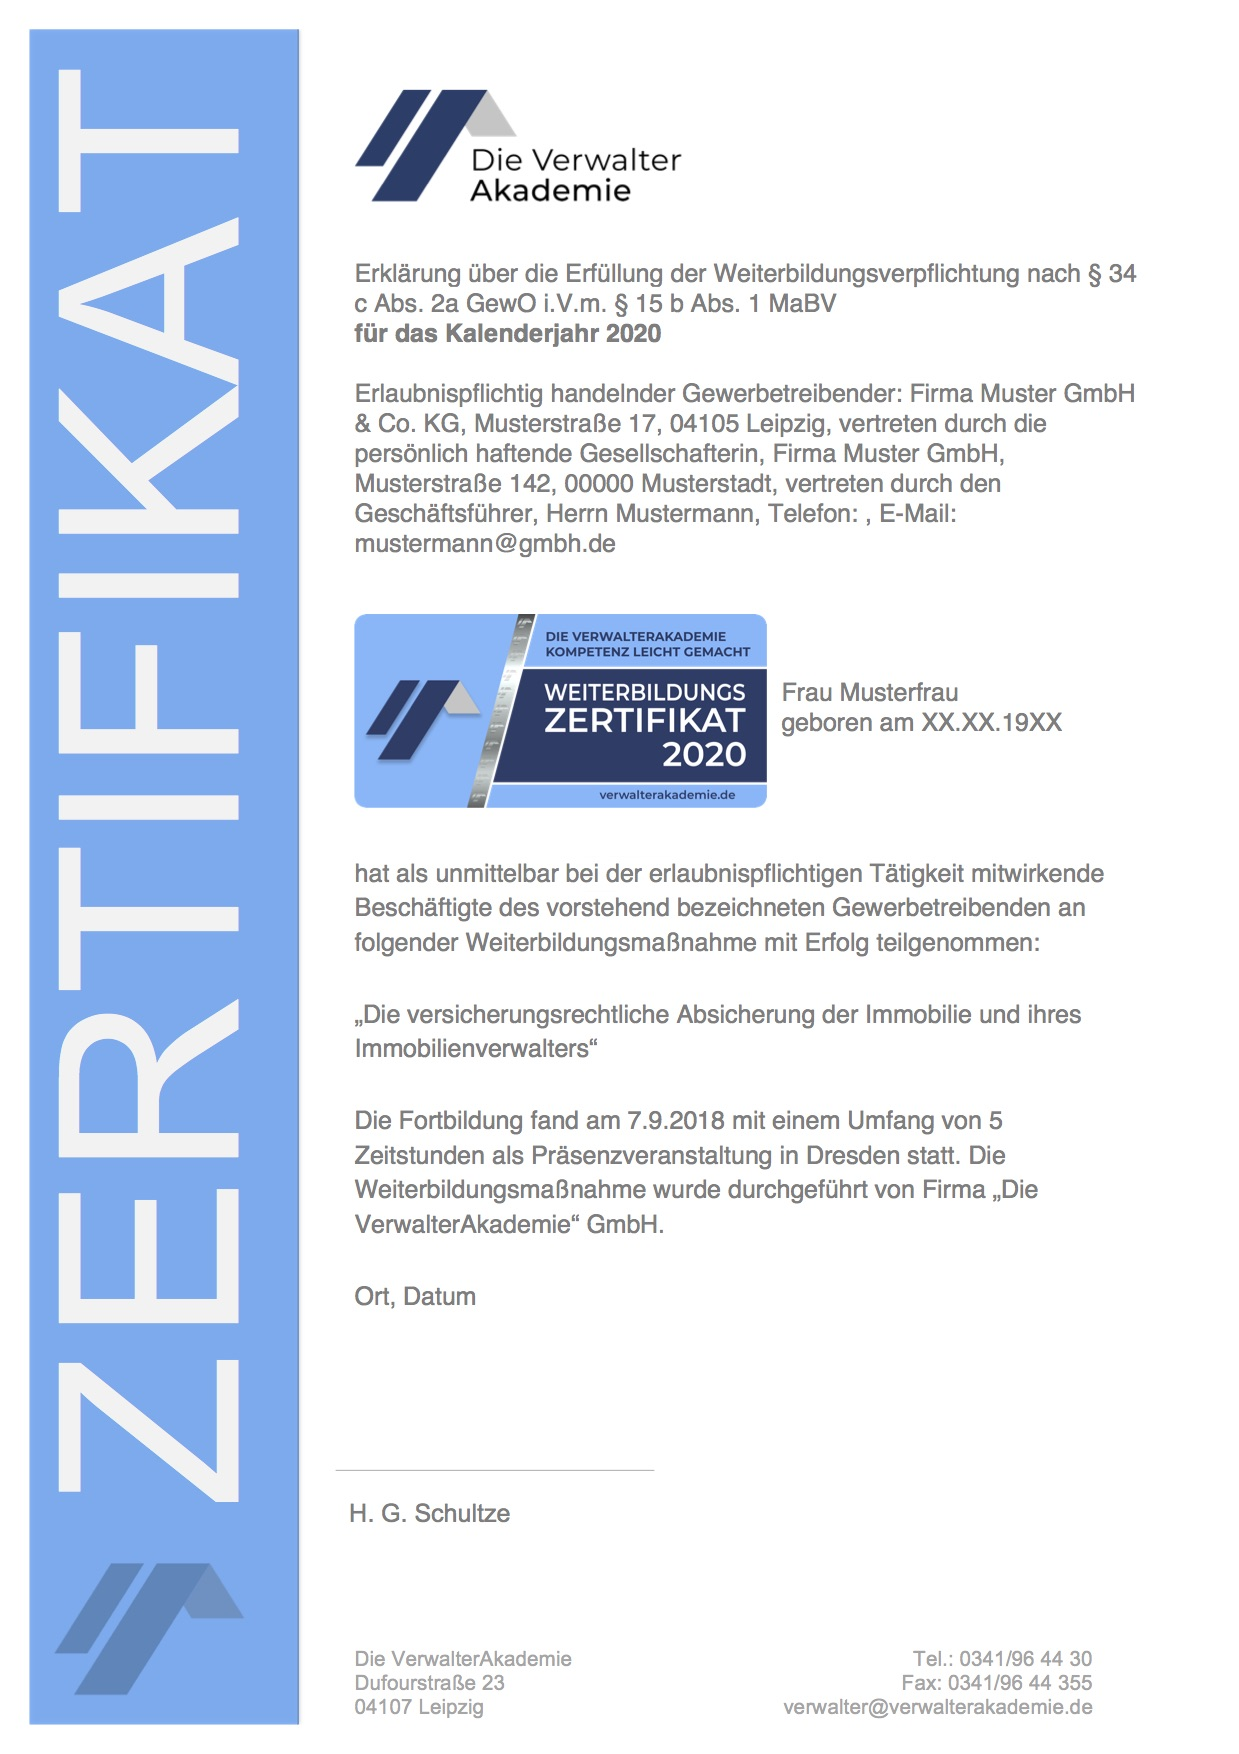 VerwalterAkademie Zertifikat 2020